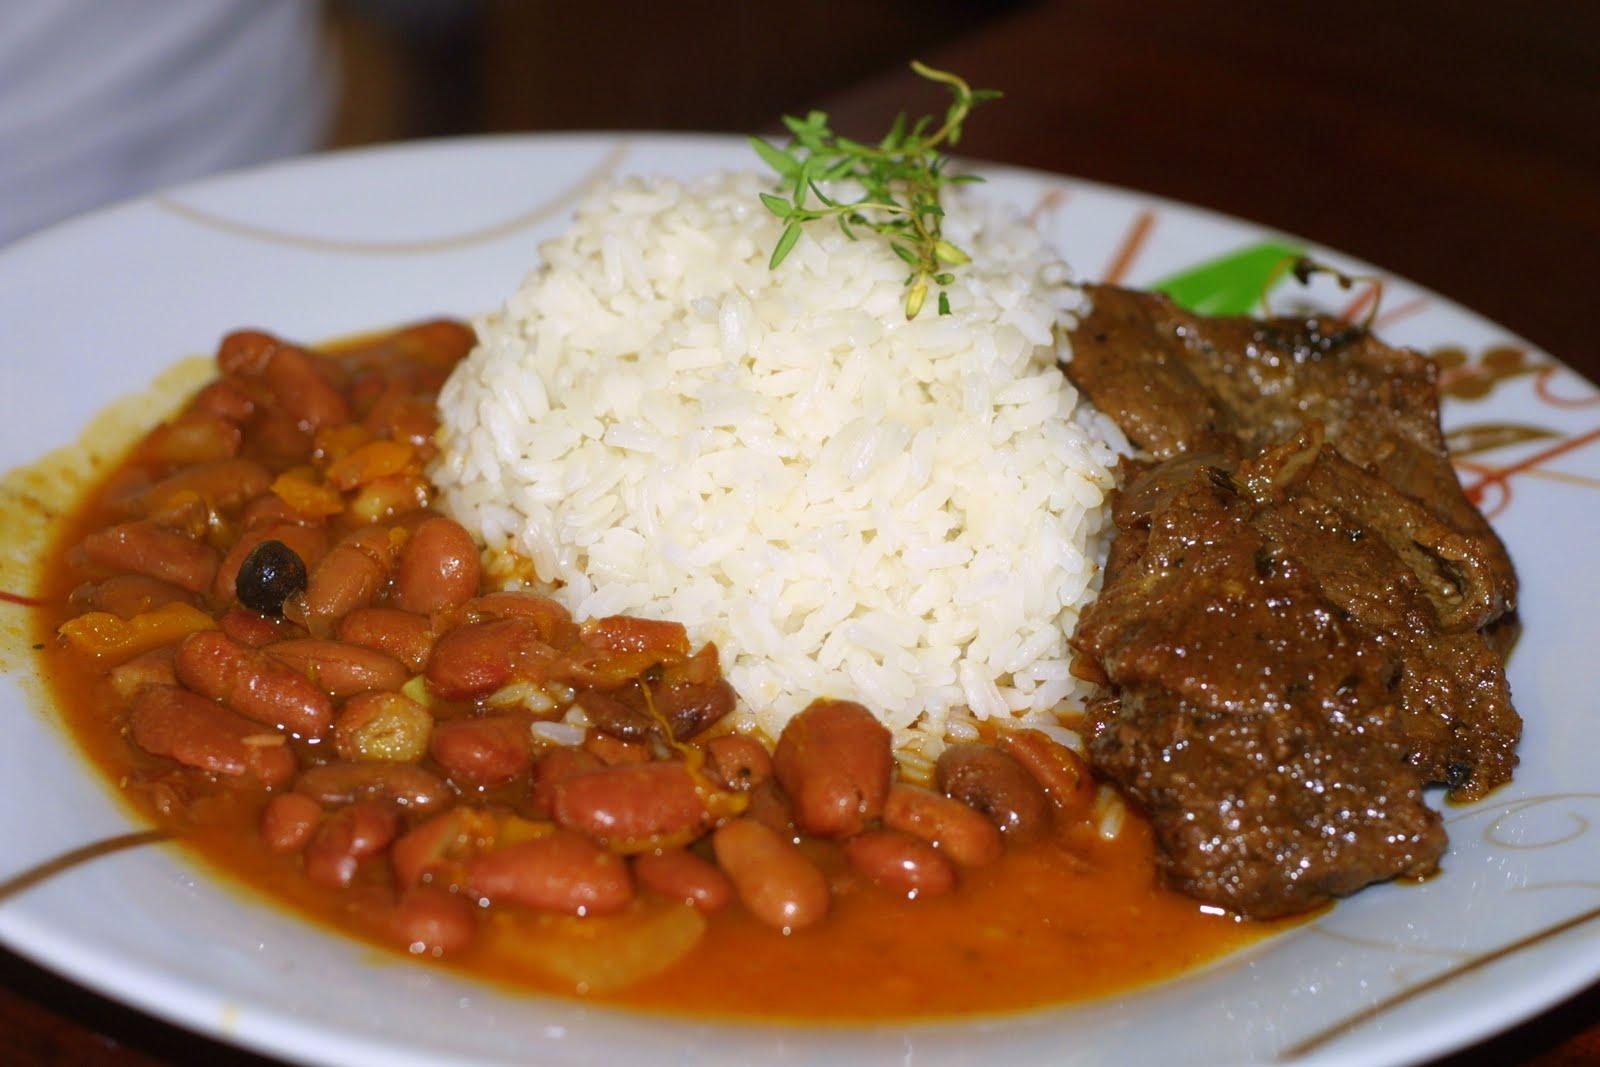 Comida caribe a ra ces tradici n y cultura gastron mica for Alta cuisine panama